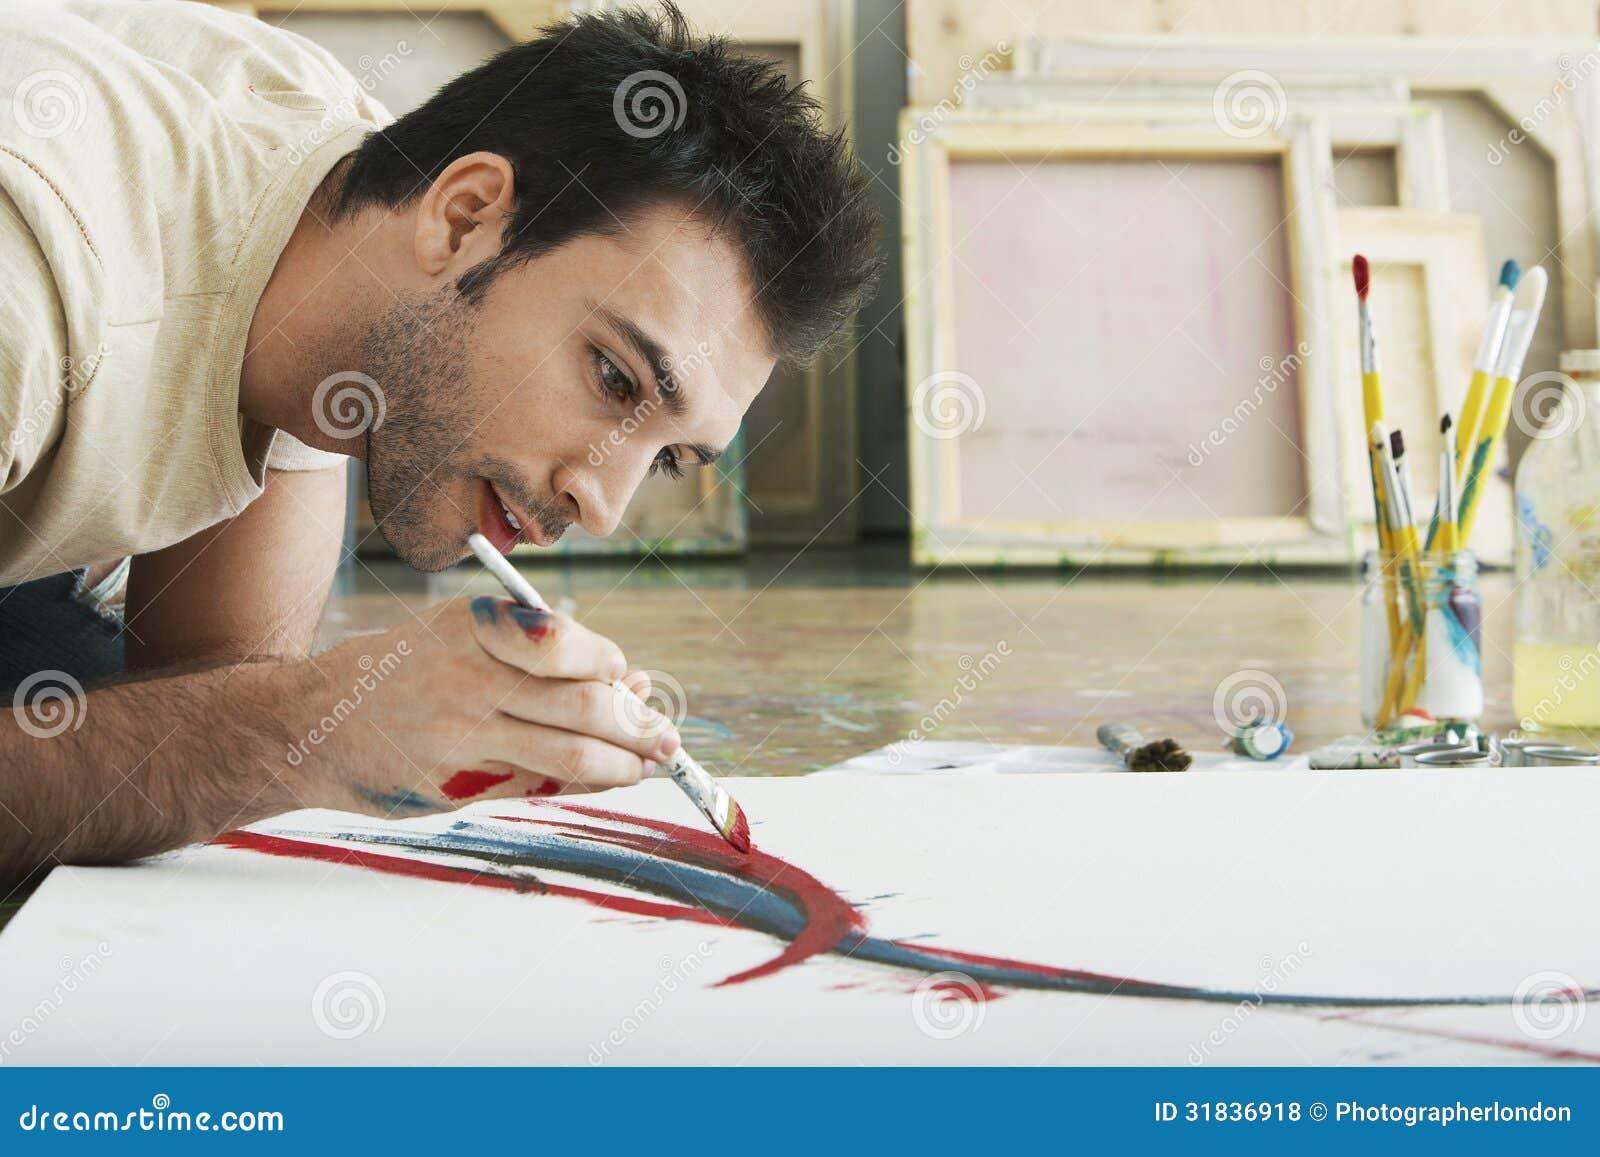 Man Painting On Canvas On Studio Floor Stock Photo Image